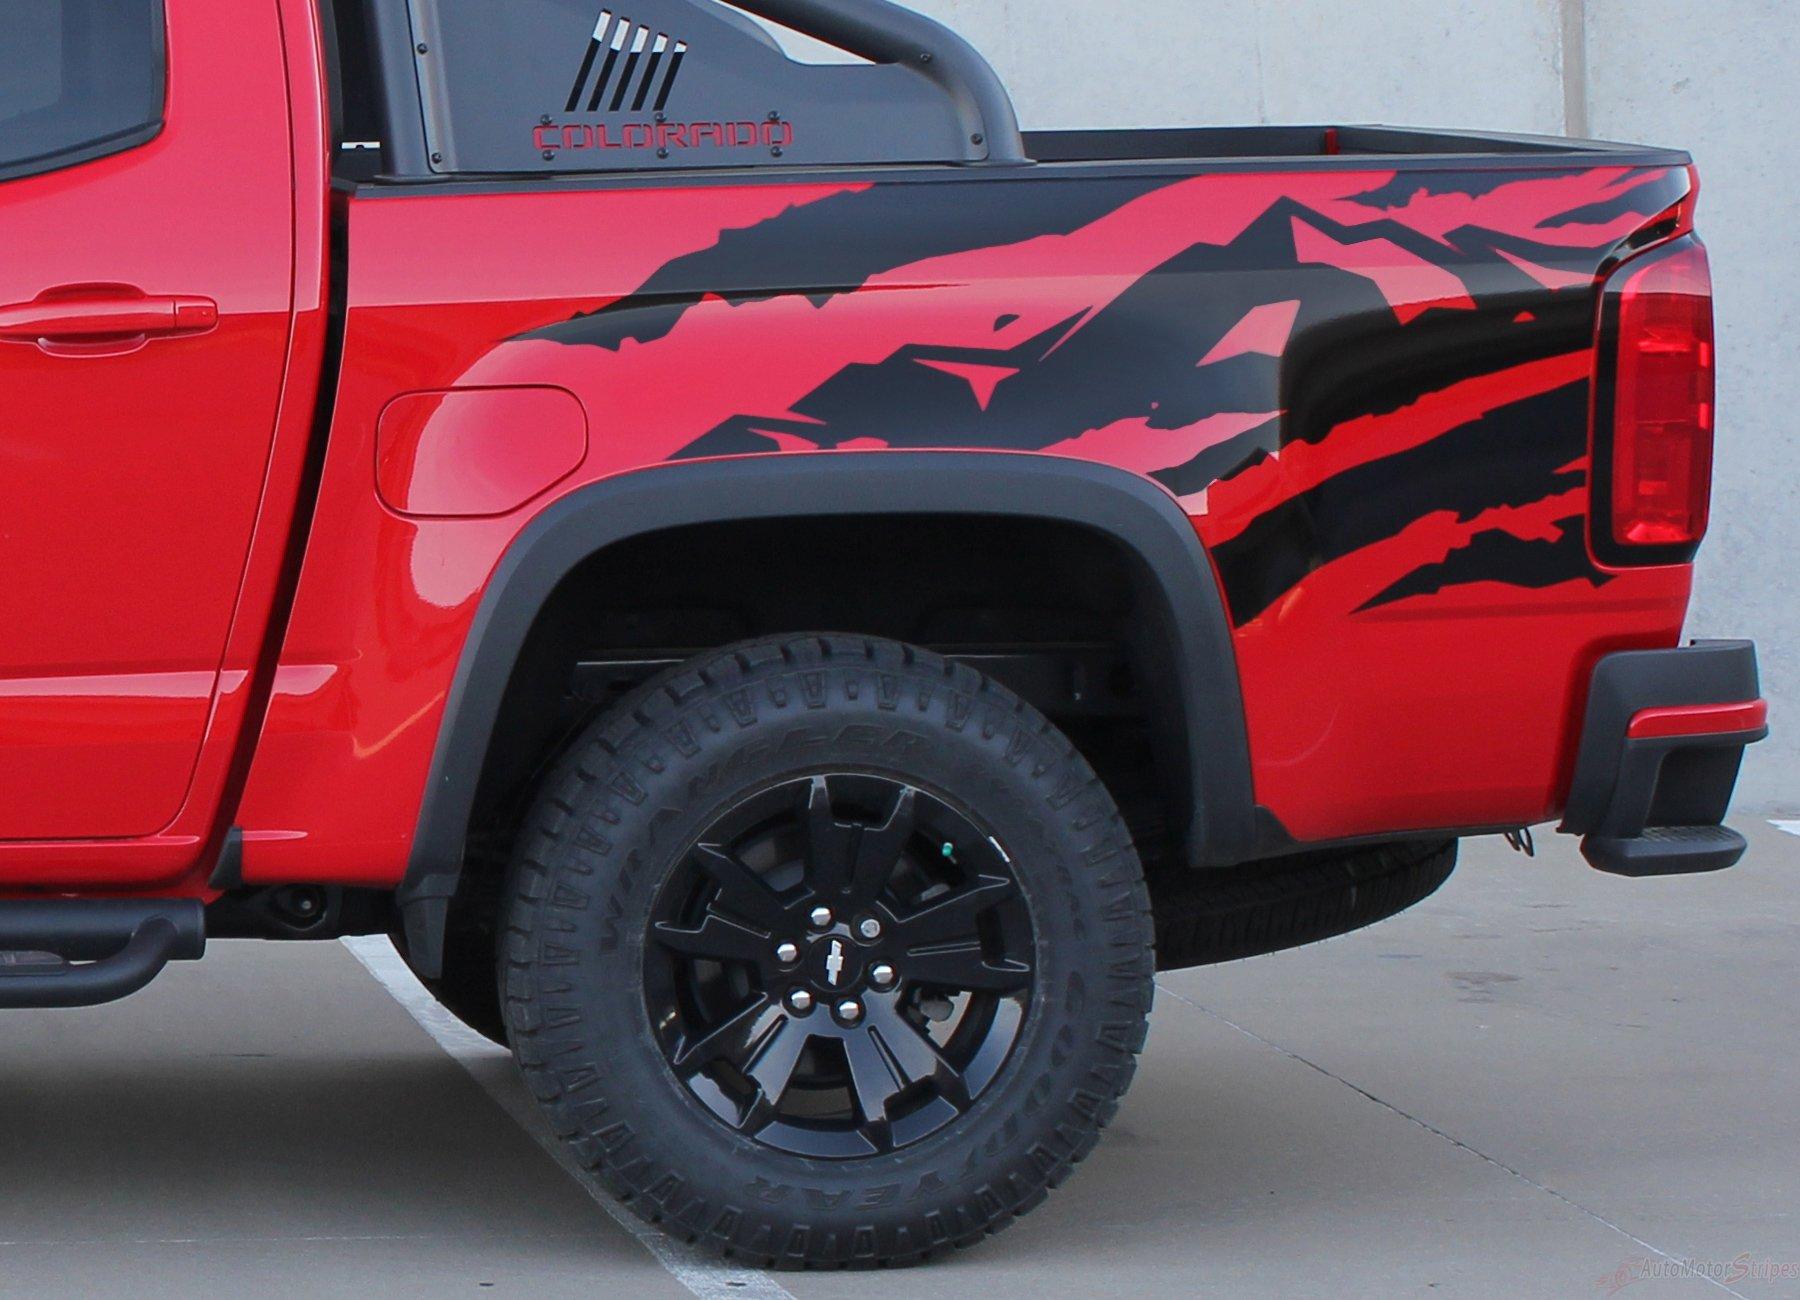 2015 2016 2017 2018 chevy colorado antero rear side truck bed mountain scene accent vinyl graphics 3m stripes kit [ 1800 x 1300 Pixel ]